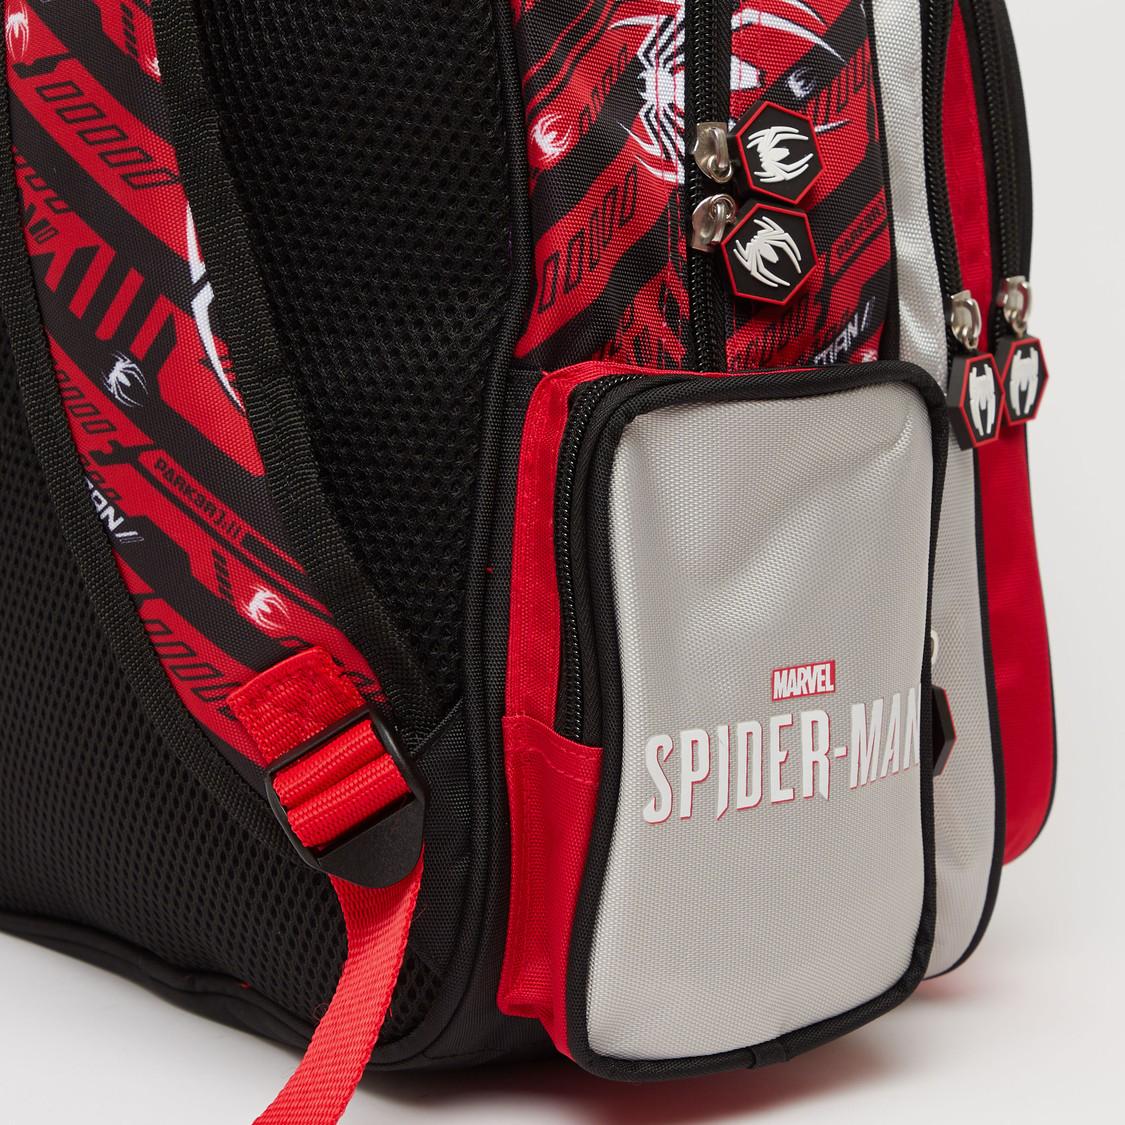 Spider-Man Print Backpack with Adjustable Shoulder Straps - 14 Inches